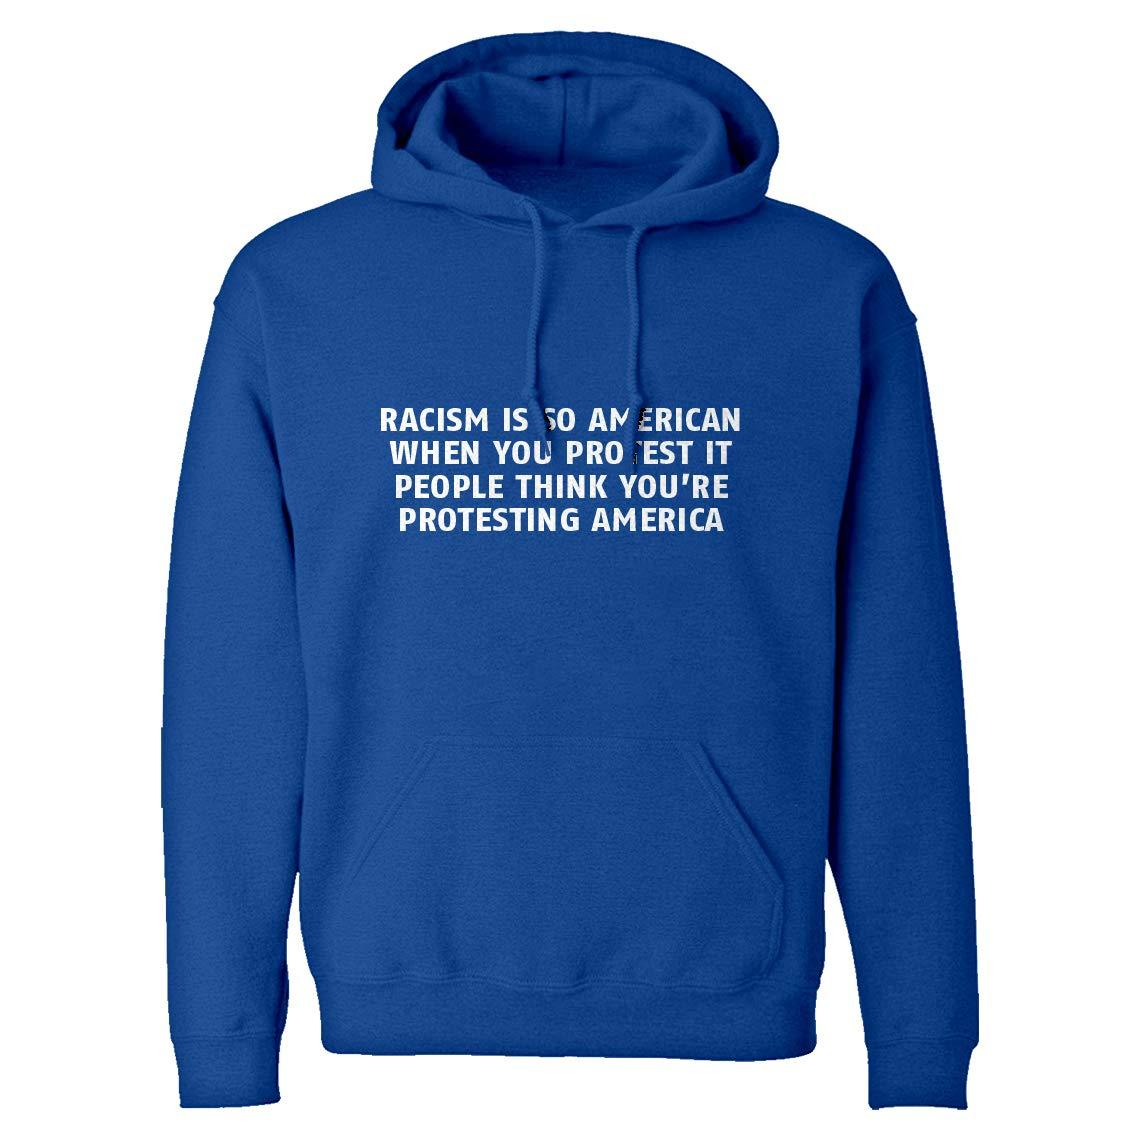 Indica Plateau Hoodie Racism is so American Small Royal Blue Hooded Sweatshirt